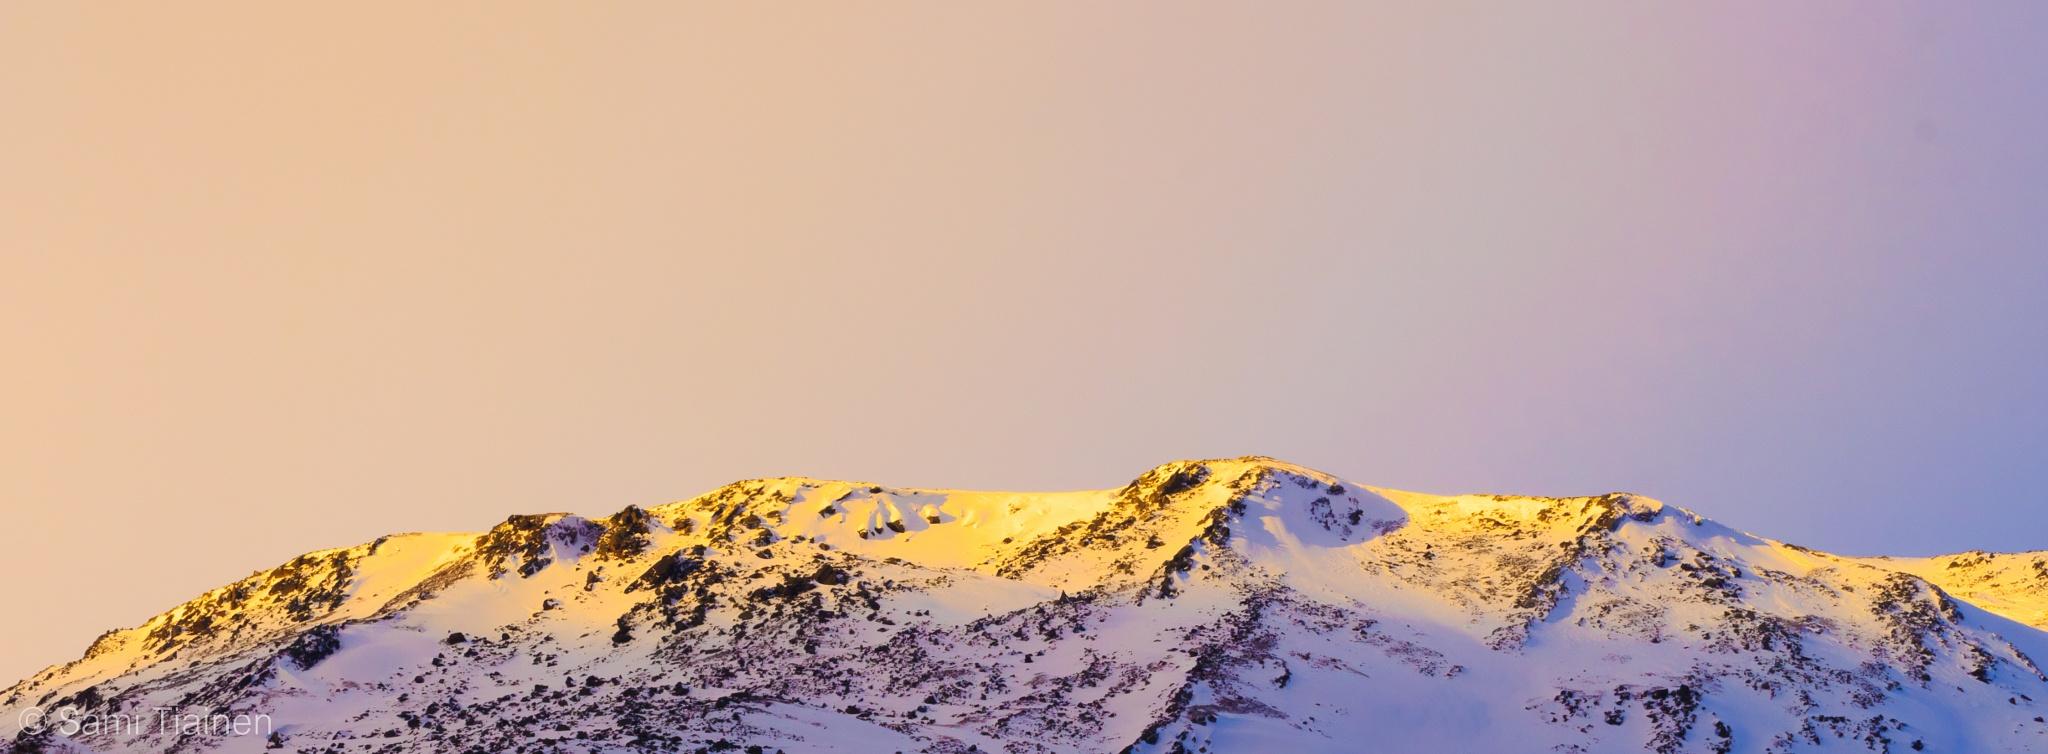 Golden mountains by Sami Tiainen